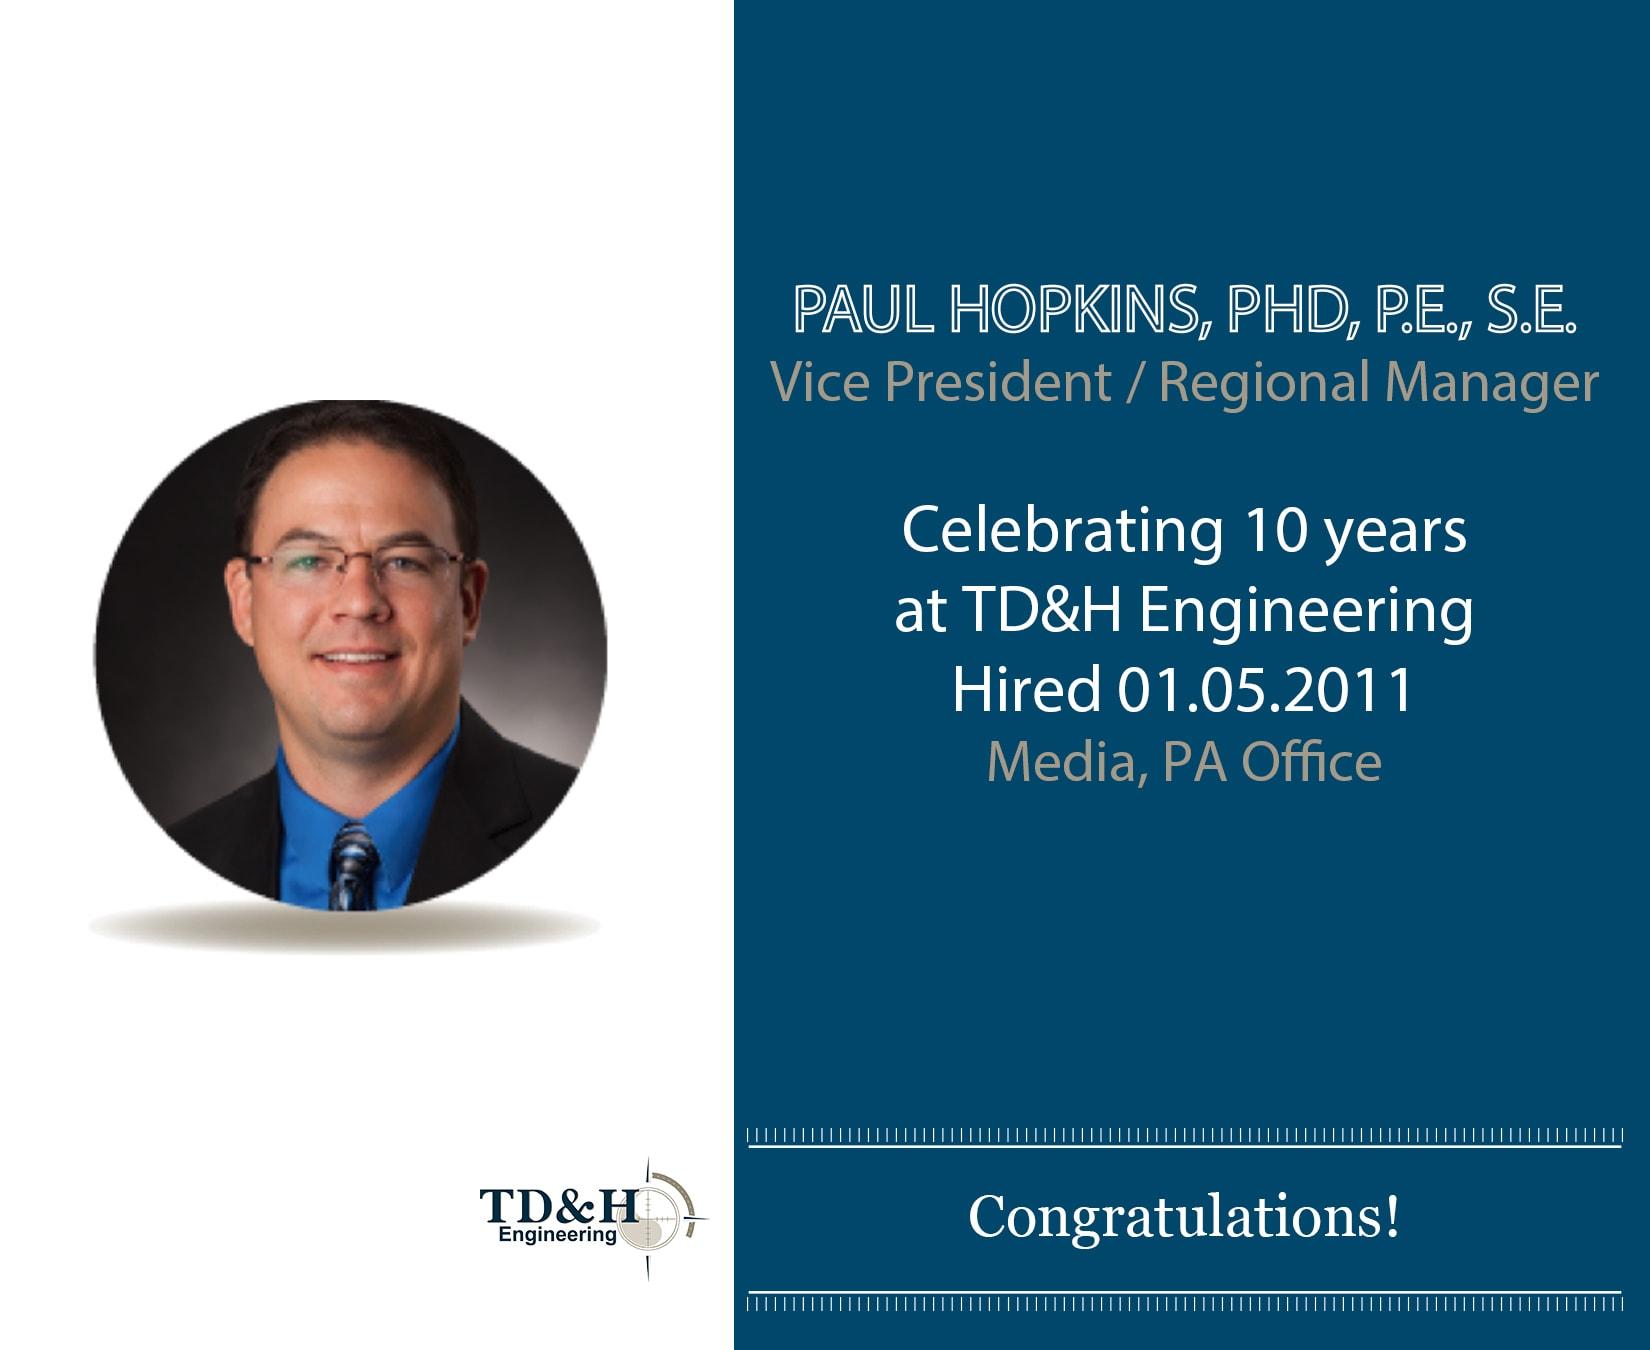 tdh-anniversary-paul-hopkins